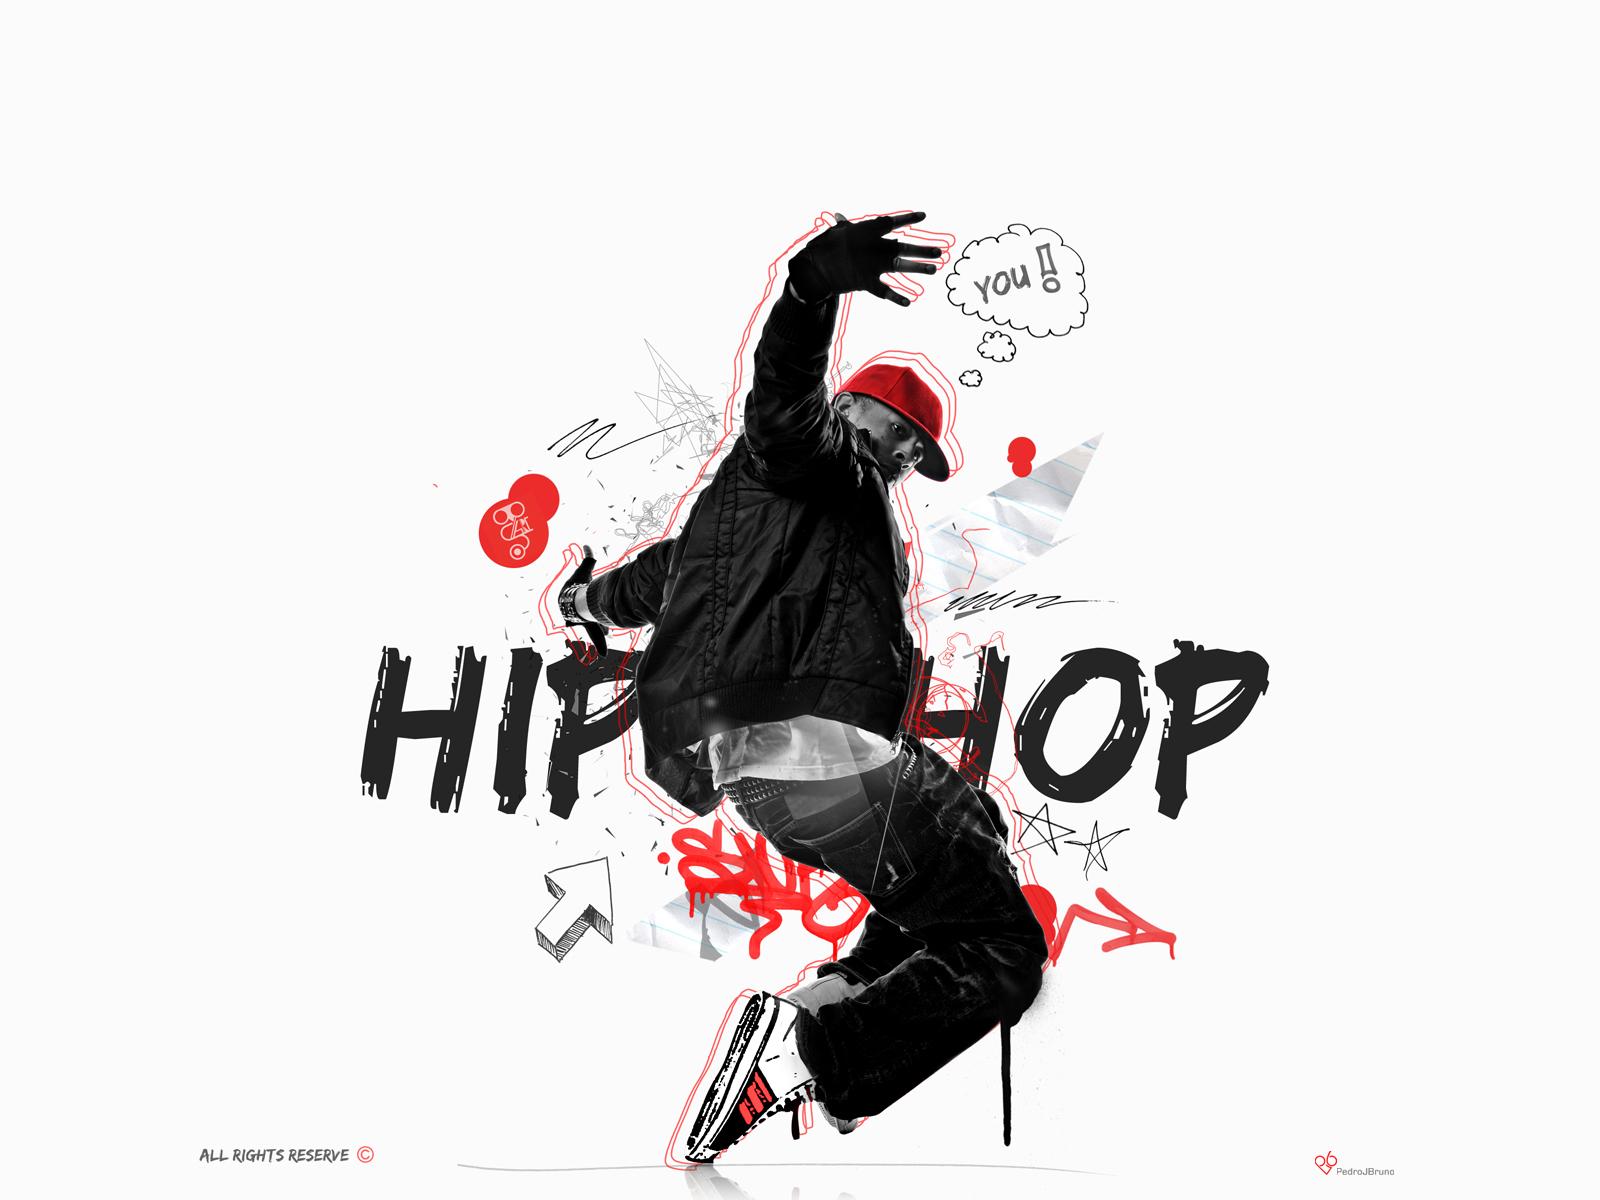 10 Best images about Hip Hop on Pinterest | Breakdance, Kids moves